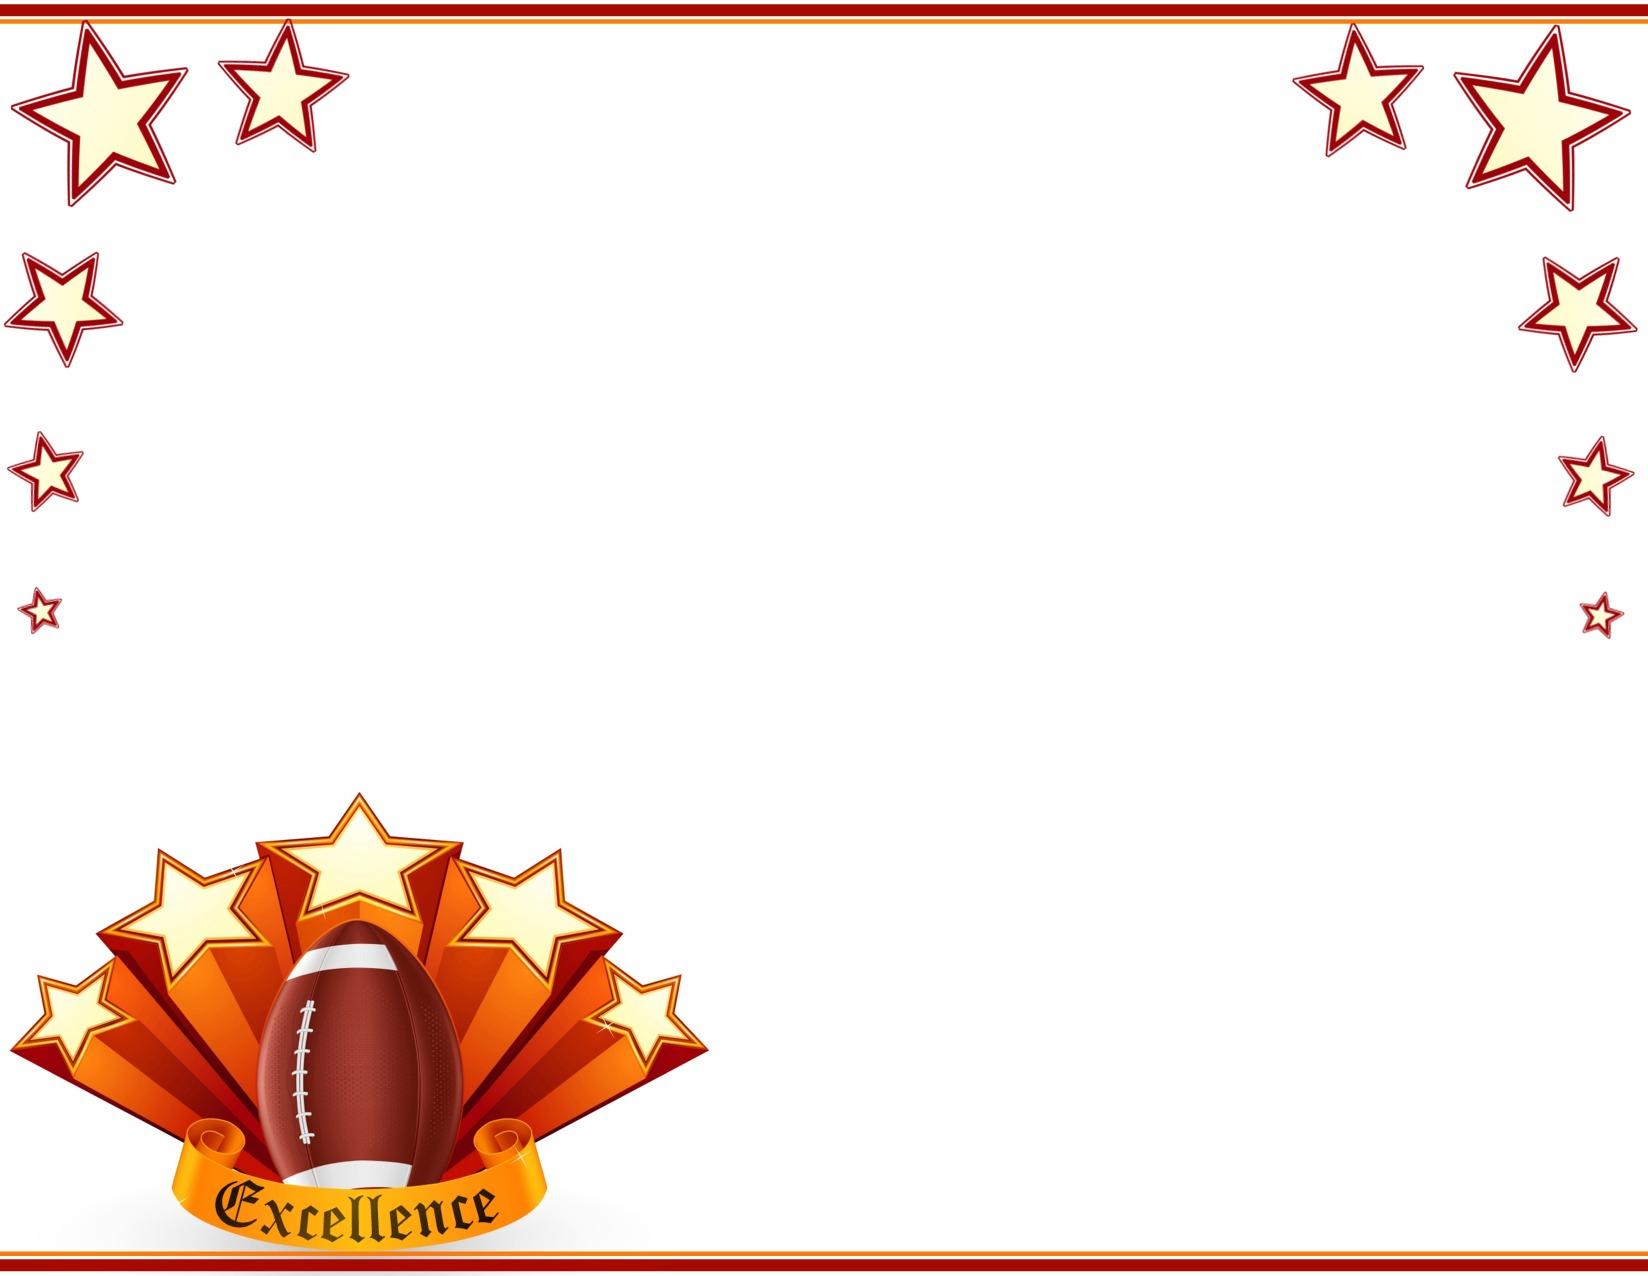 Football certificate template uk choice image certificate design fine football award certificate template pictures inspiration football certificates templates uk gallery templates example yadclub choice 1betcityfo Gallery